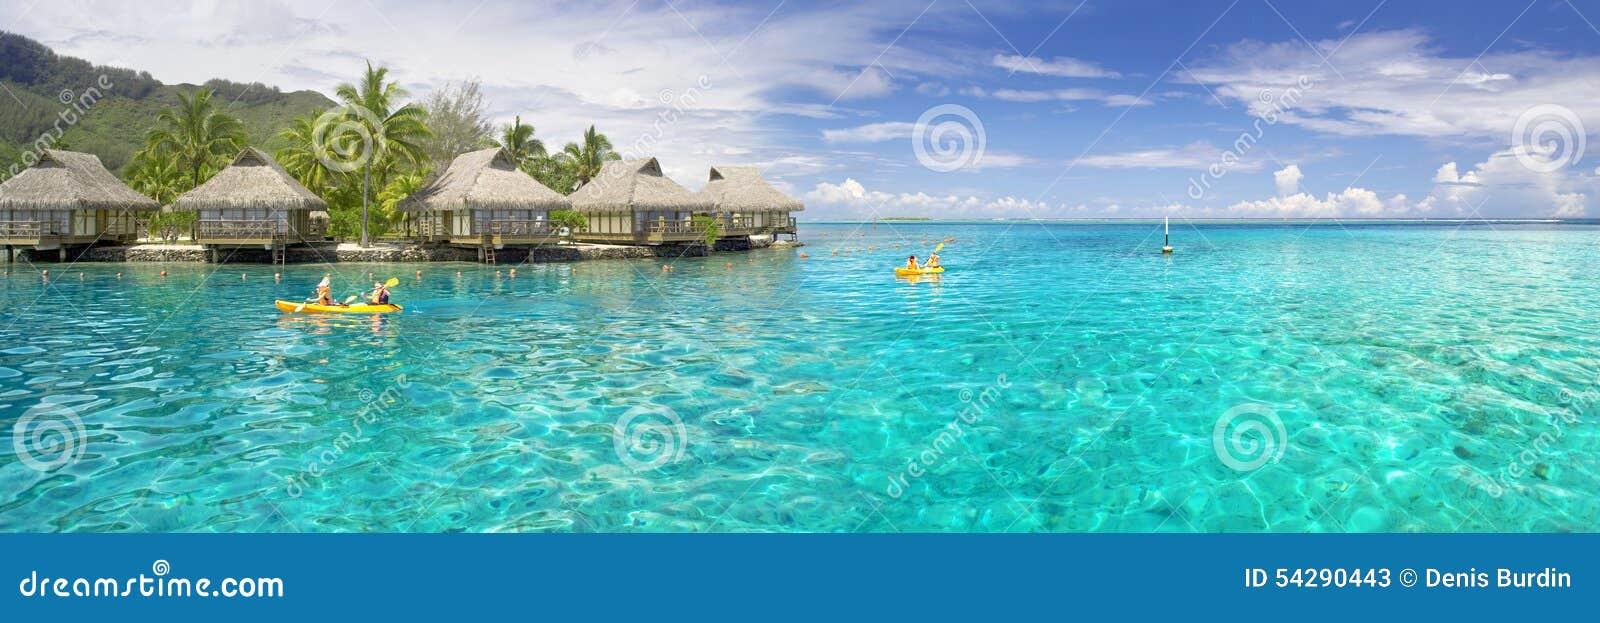 Tropical island editorial stock photo image 54290443 Beautiful vacation spots